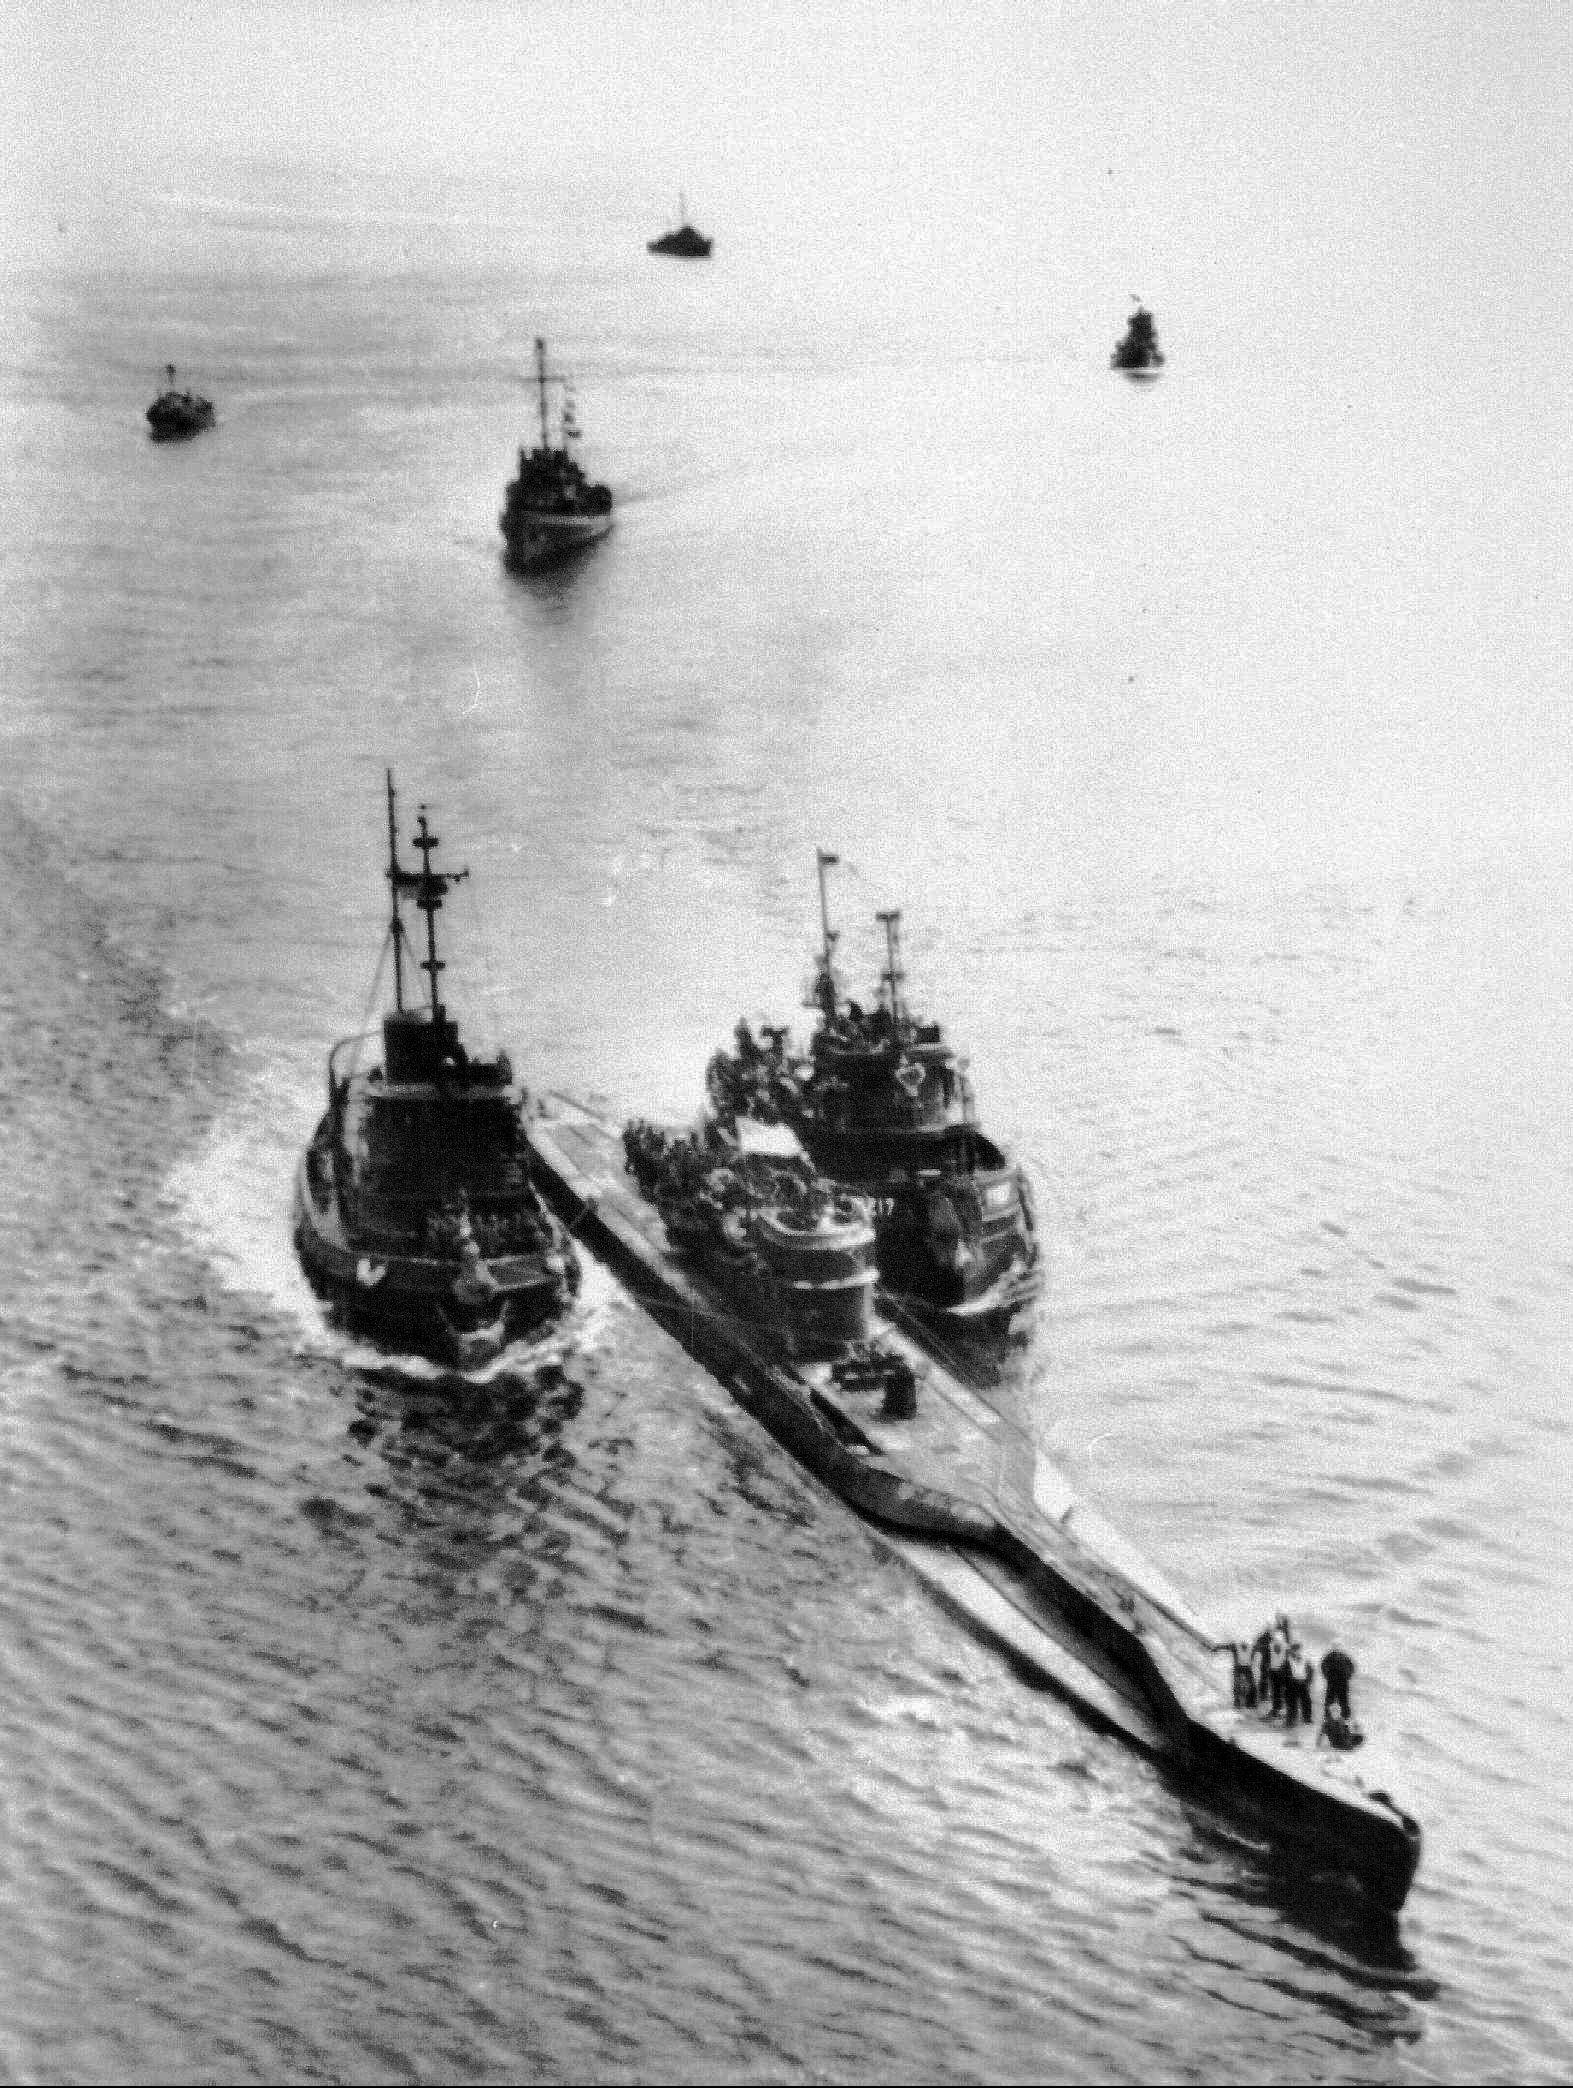 GERMAN SUB-U-234 ESCORTED IN TO PORTSMOUTH HARBOR